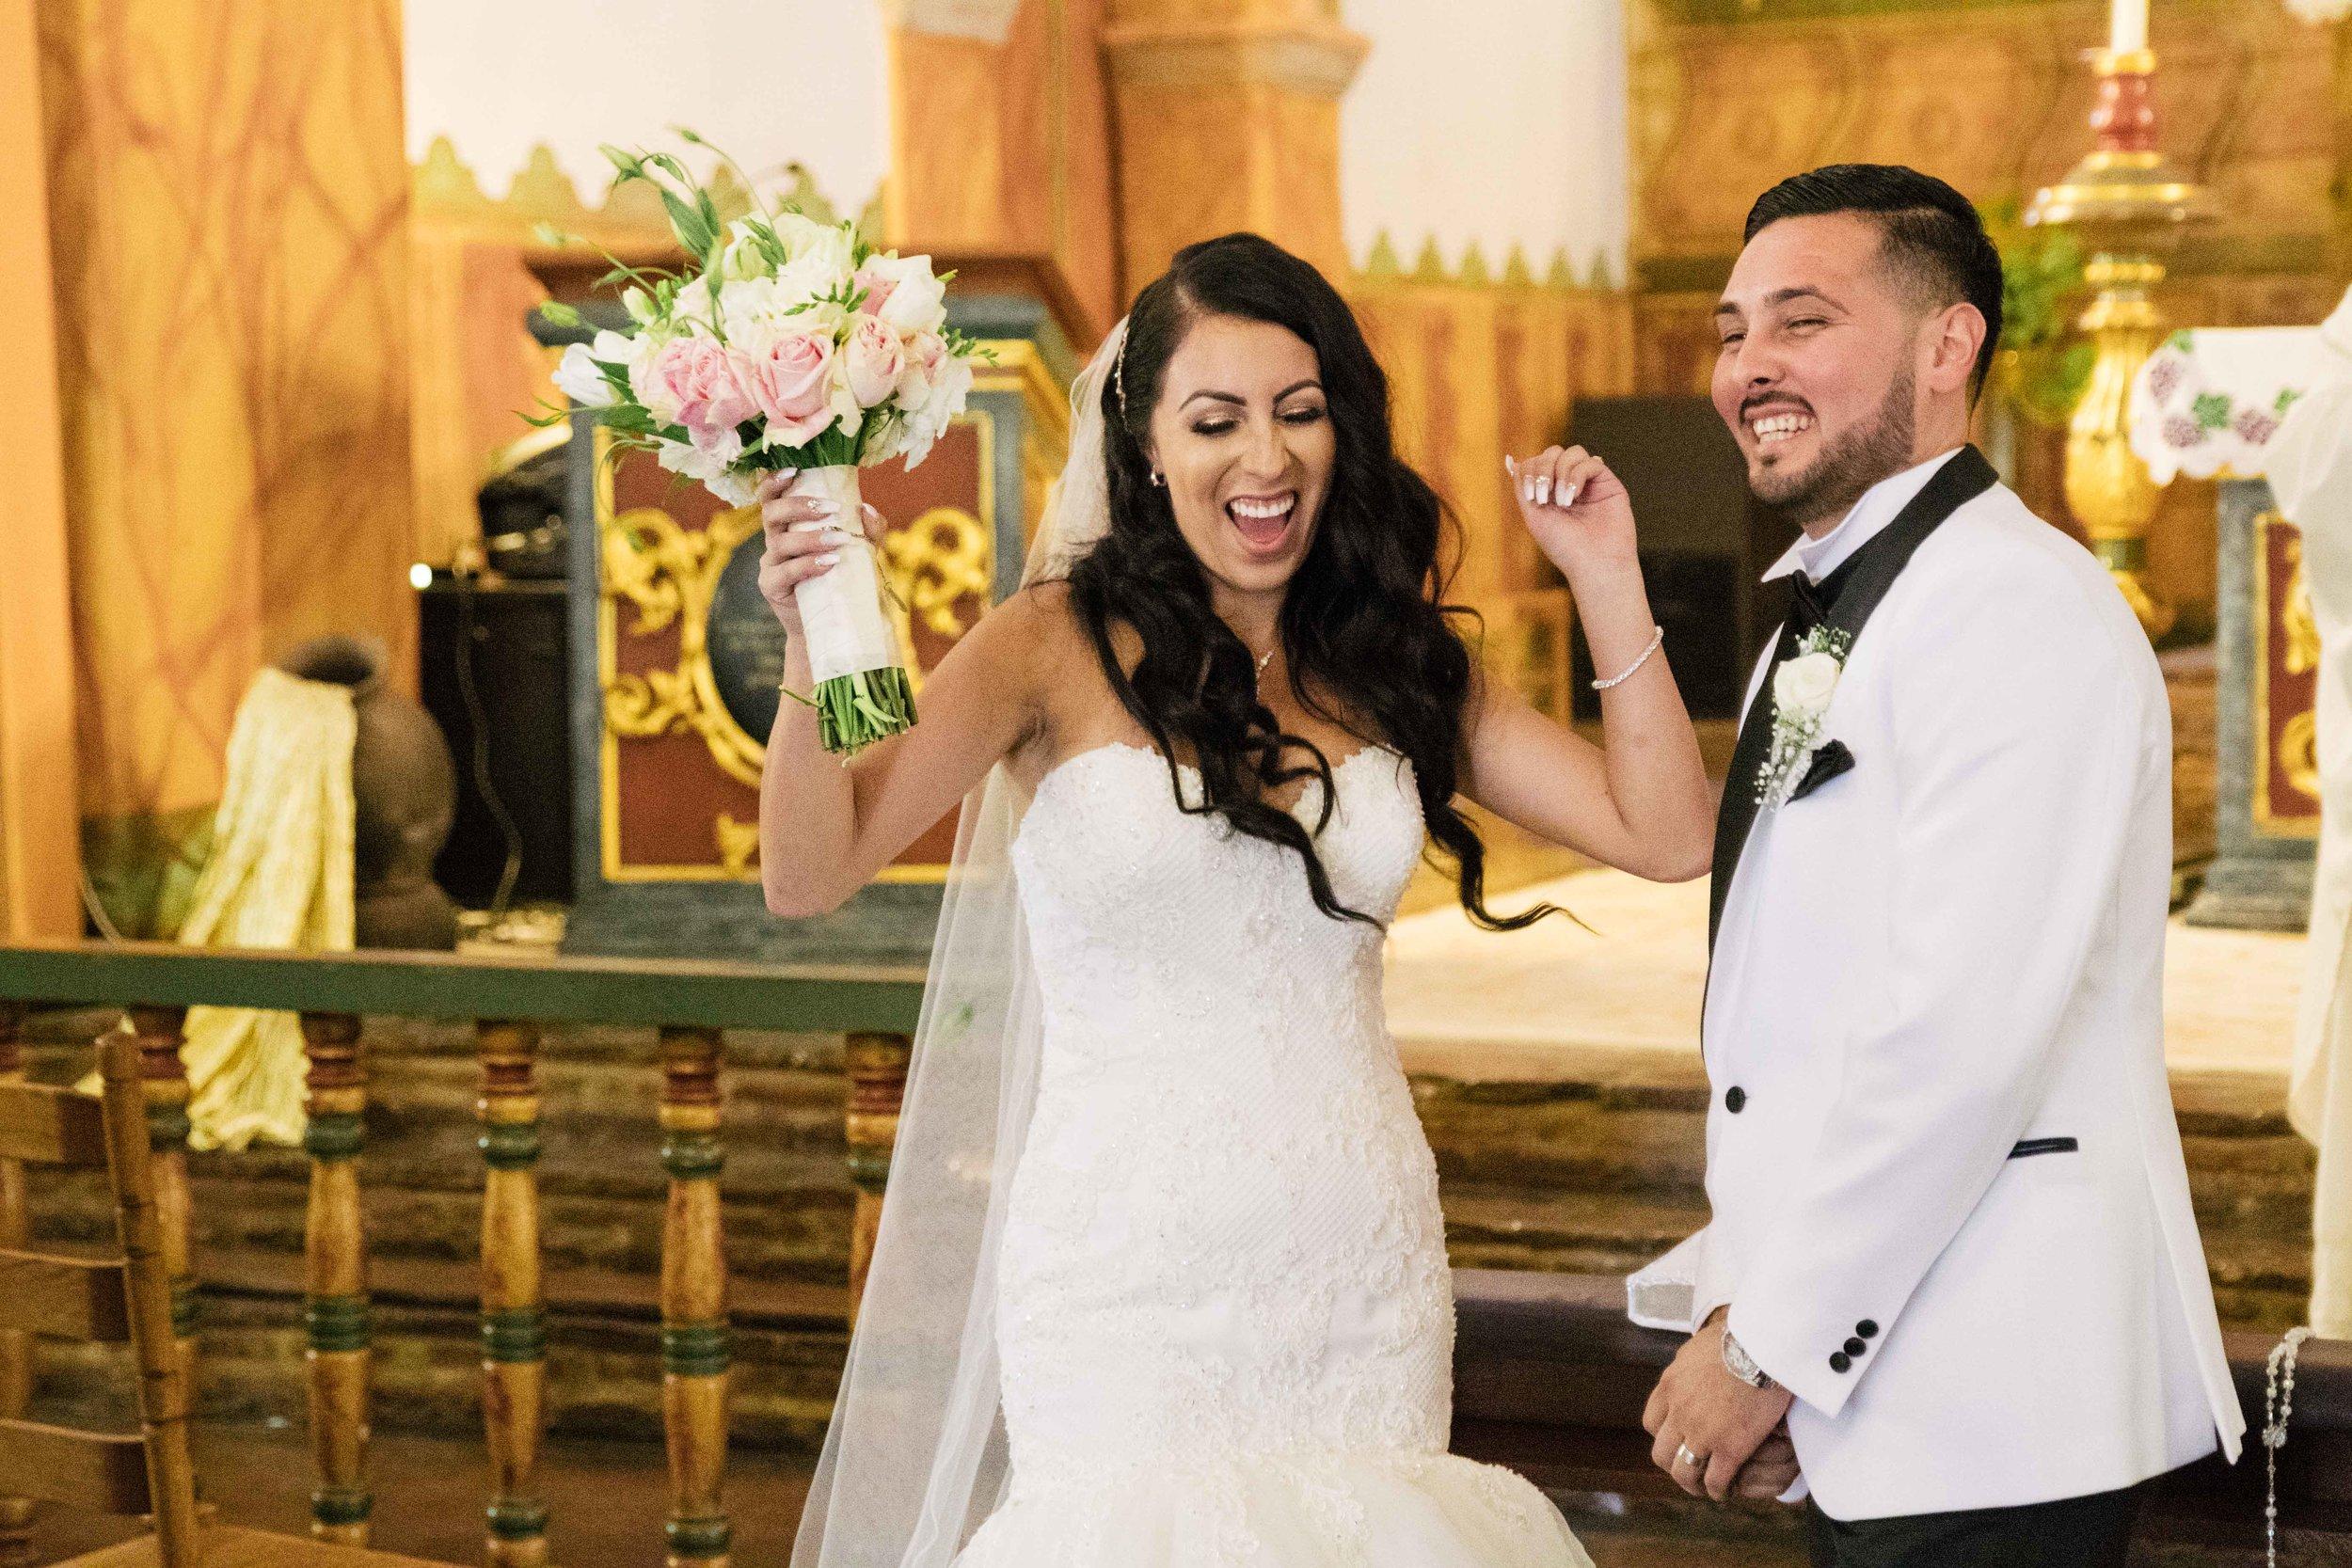 san-juan-bautista-photographer-tony-monse-wedding-276.JPG